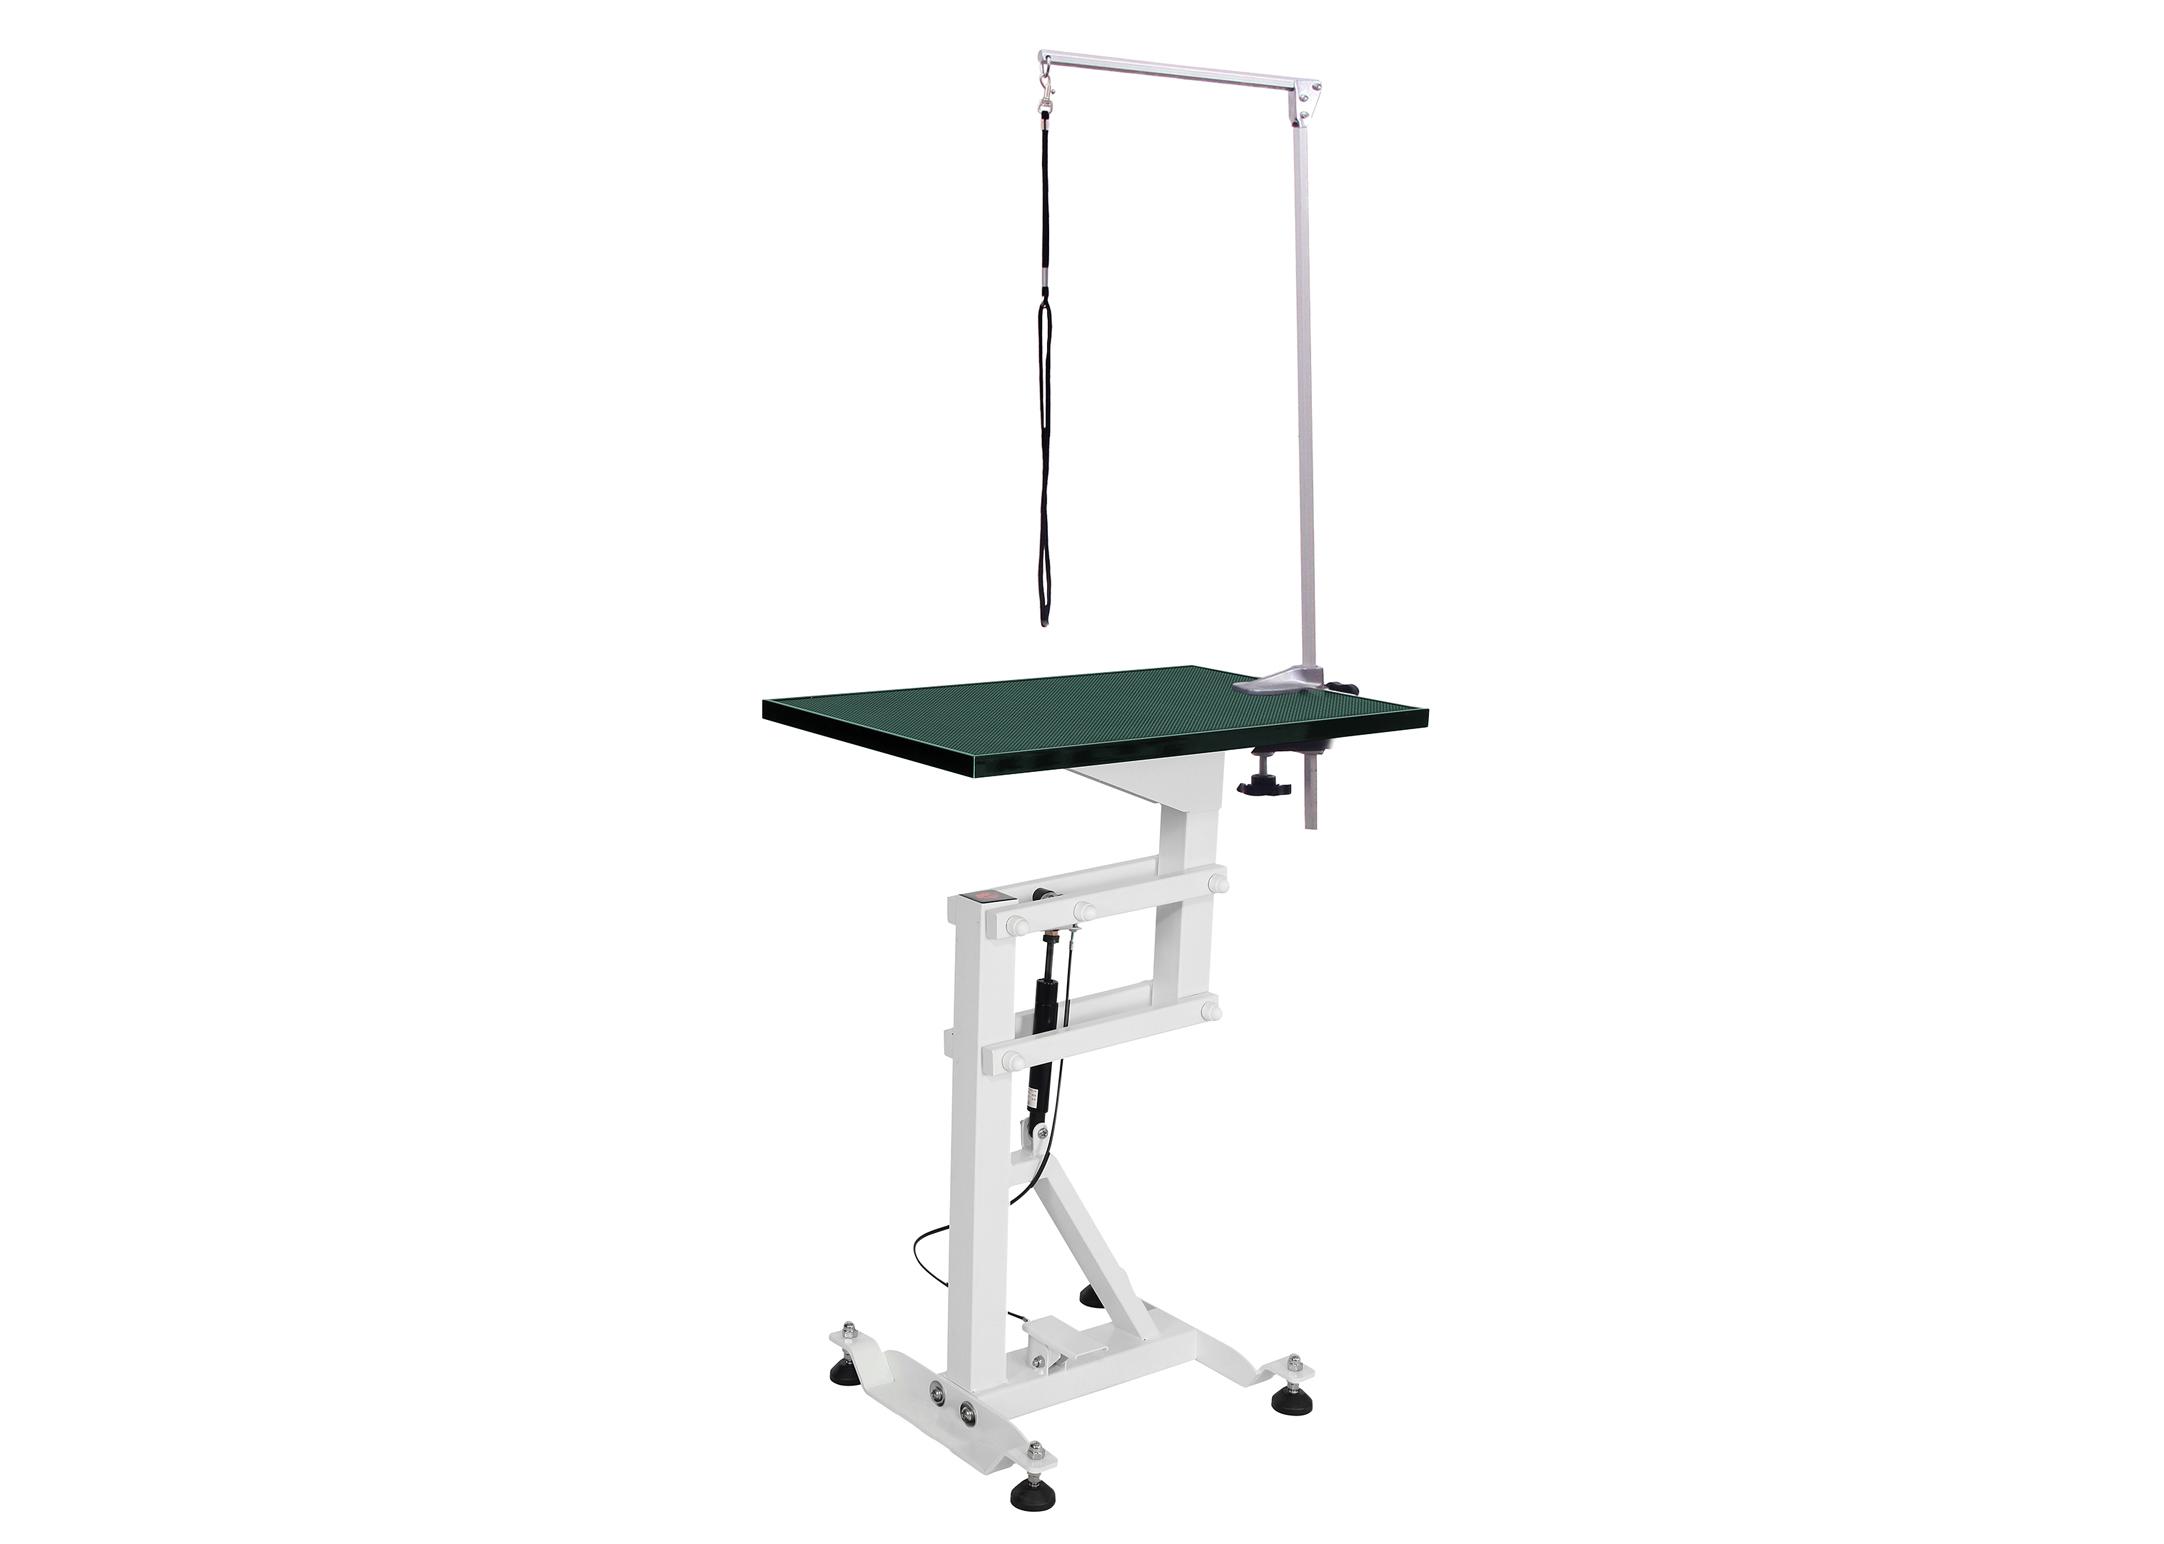 Groom-X Compact Air Lift Grooming Table Rectangular 60x40cmx80-120cmh with control post